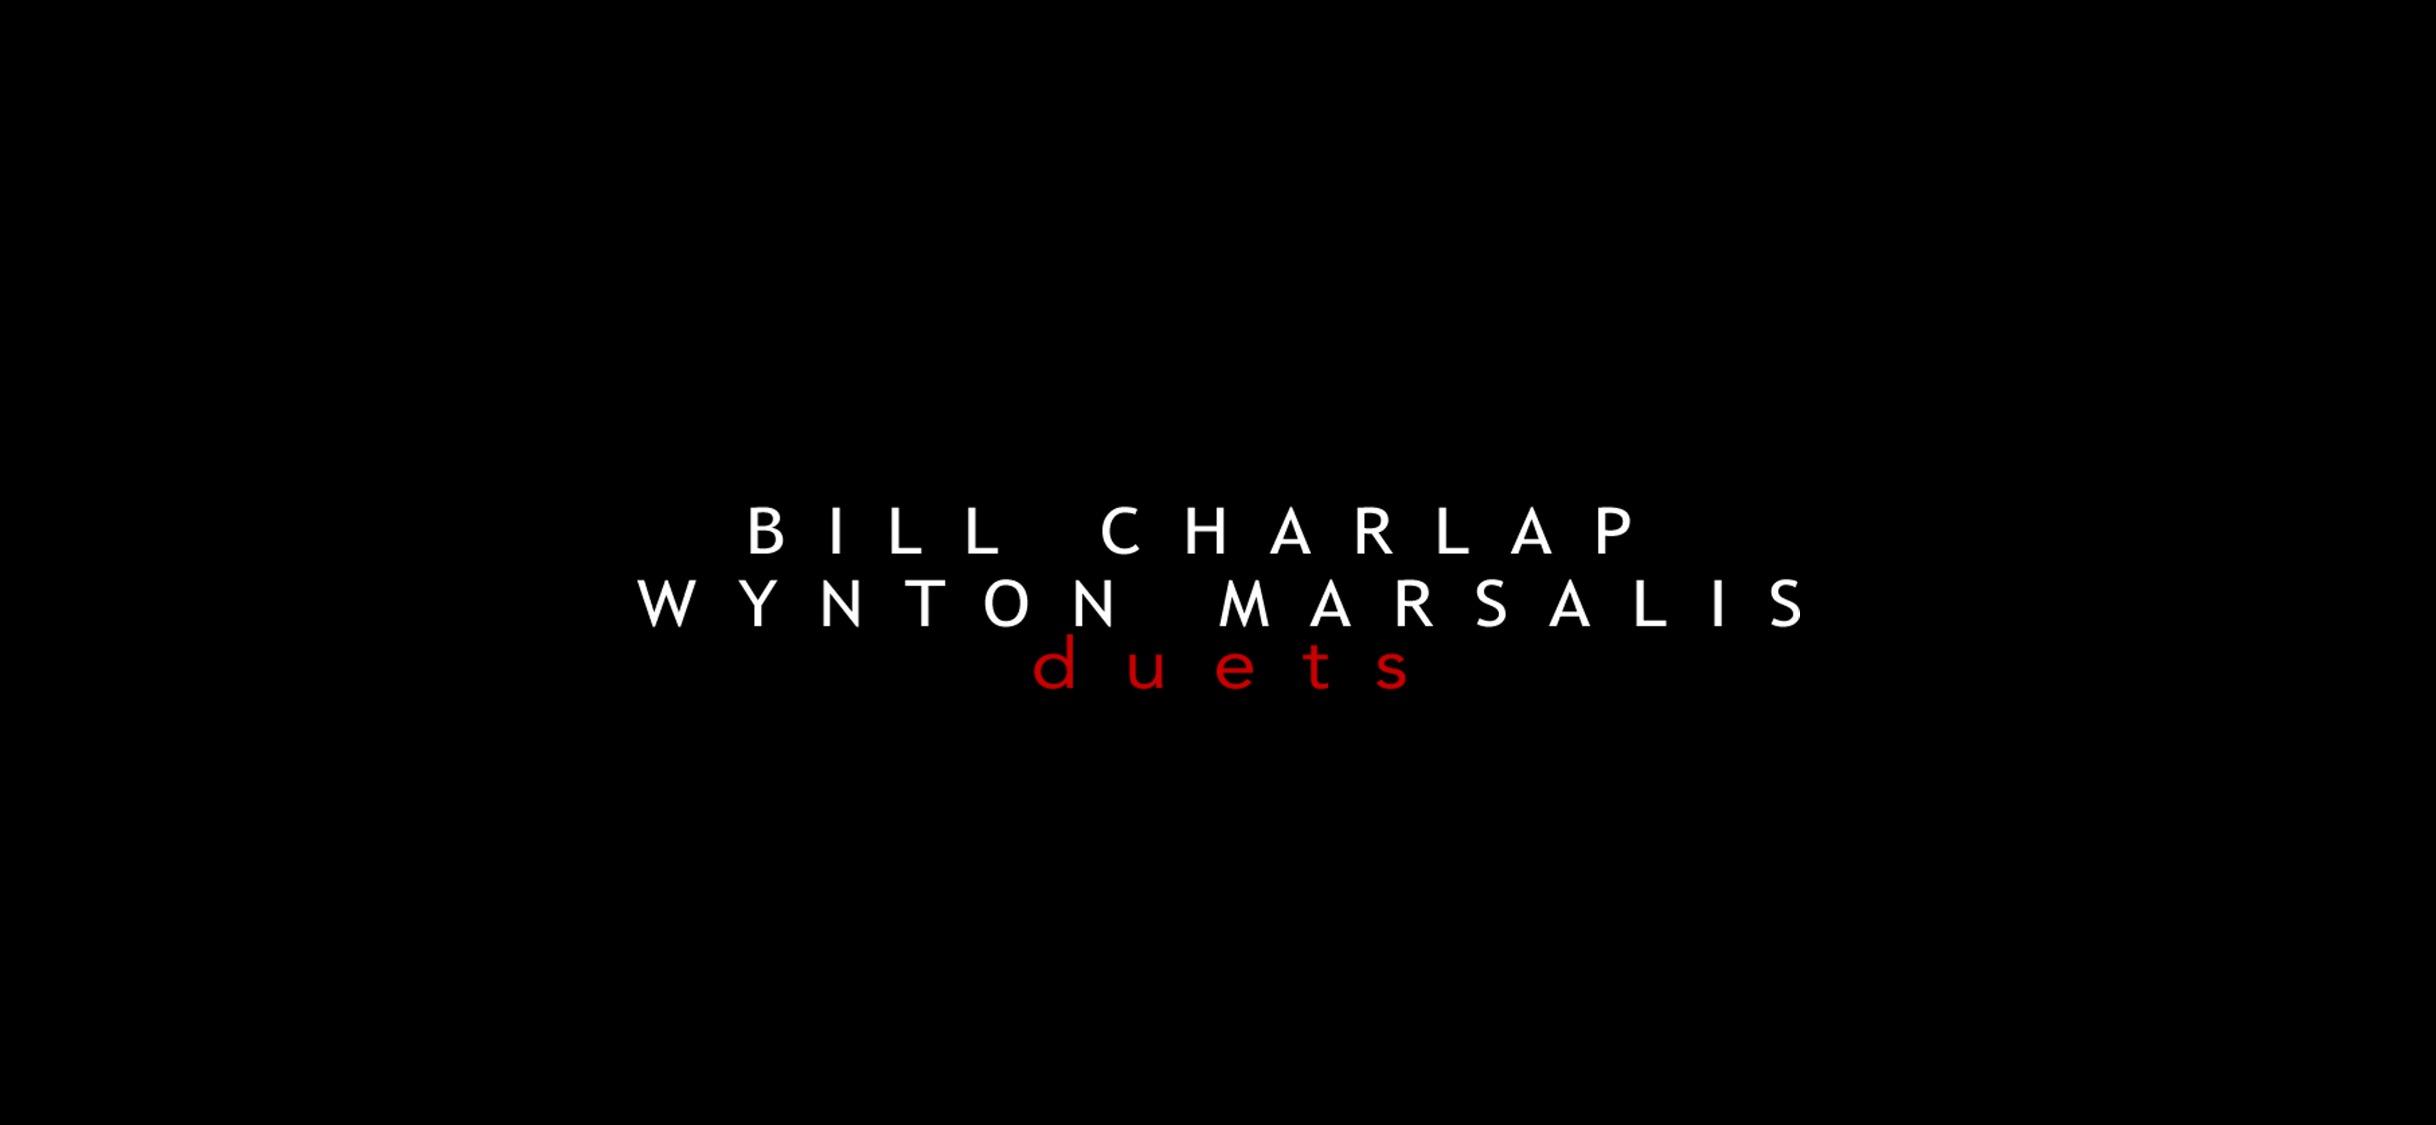 bill charlap wynton marsalis title